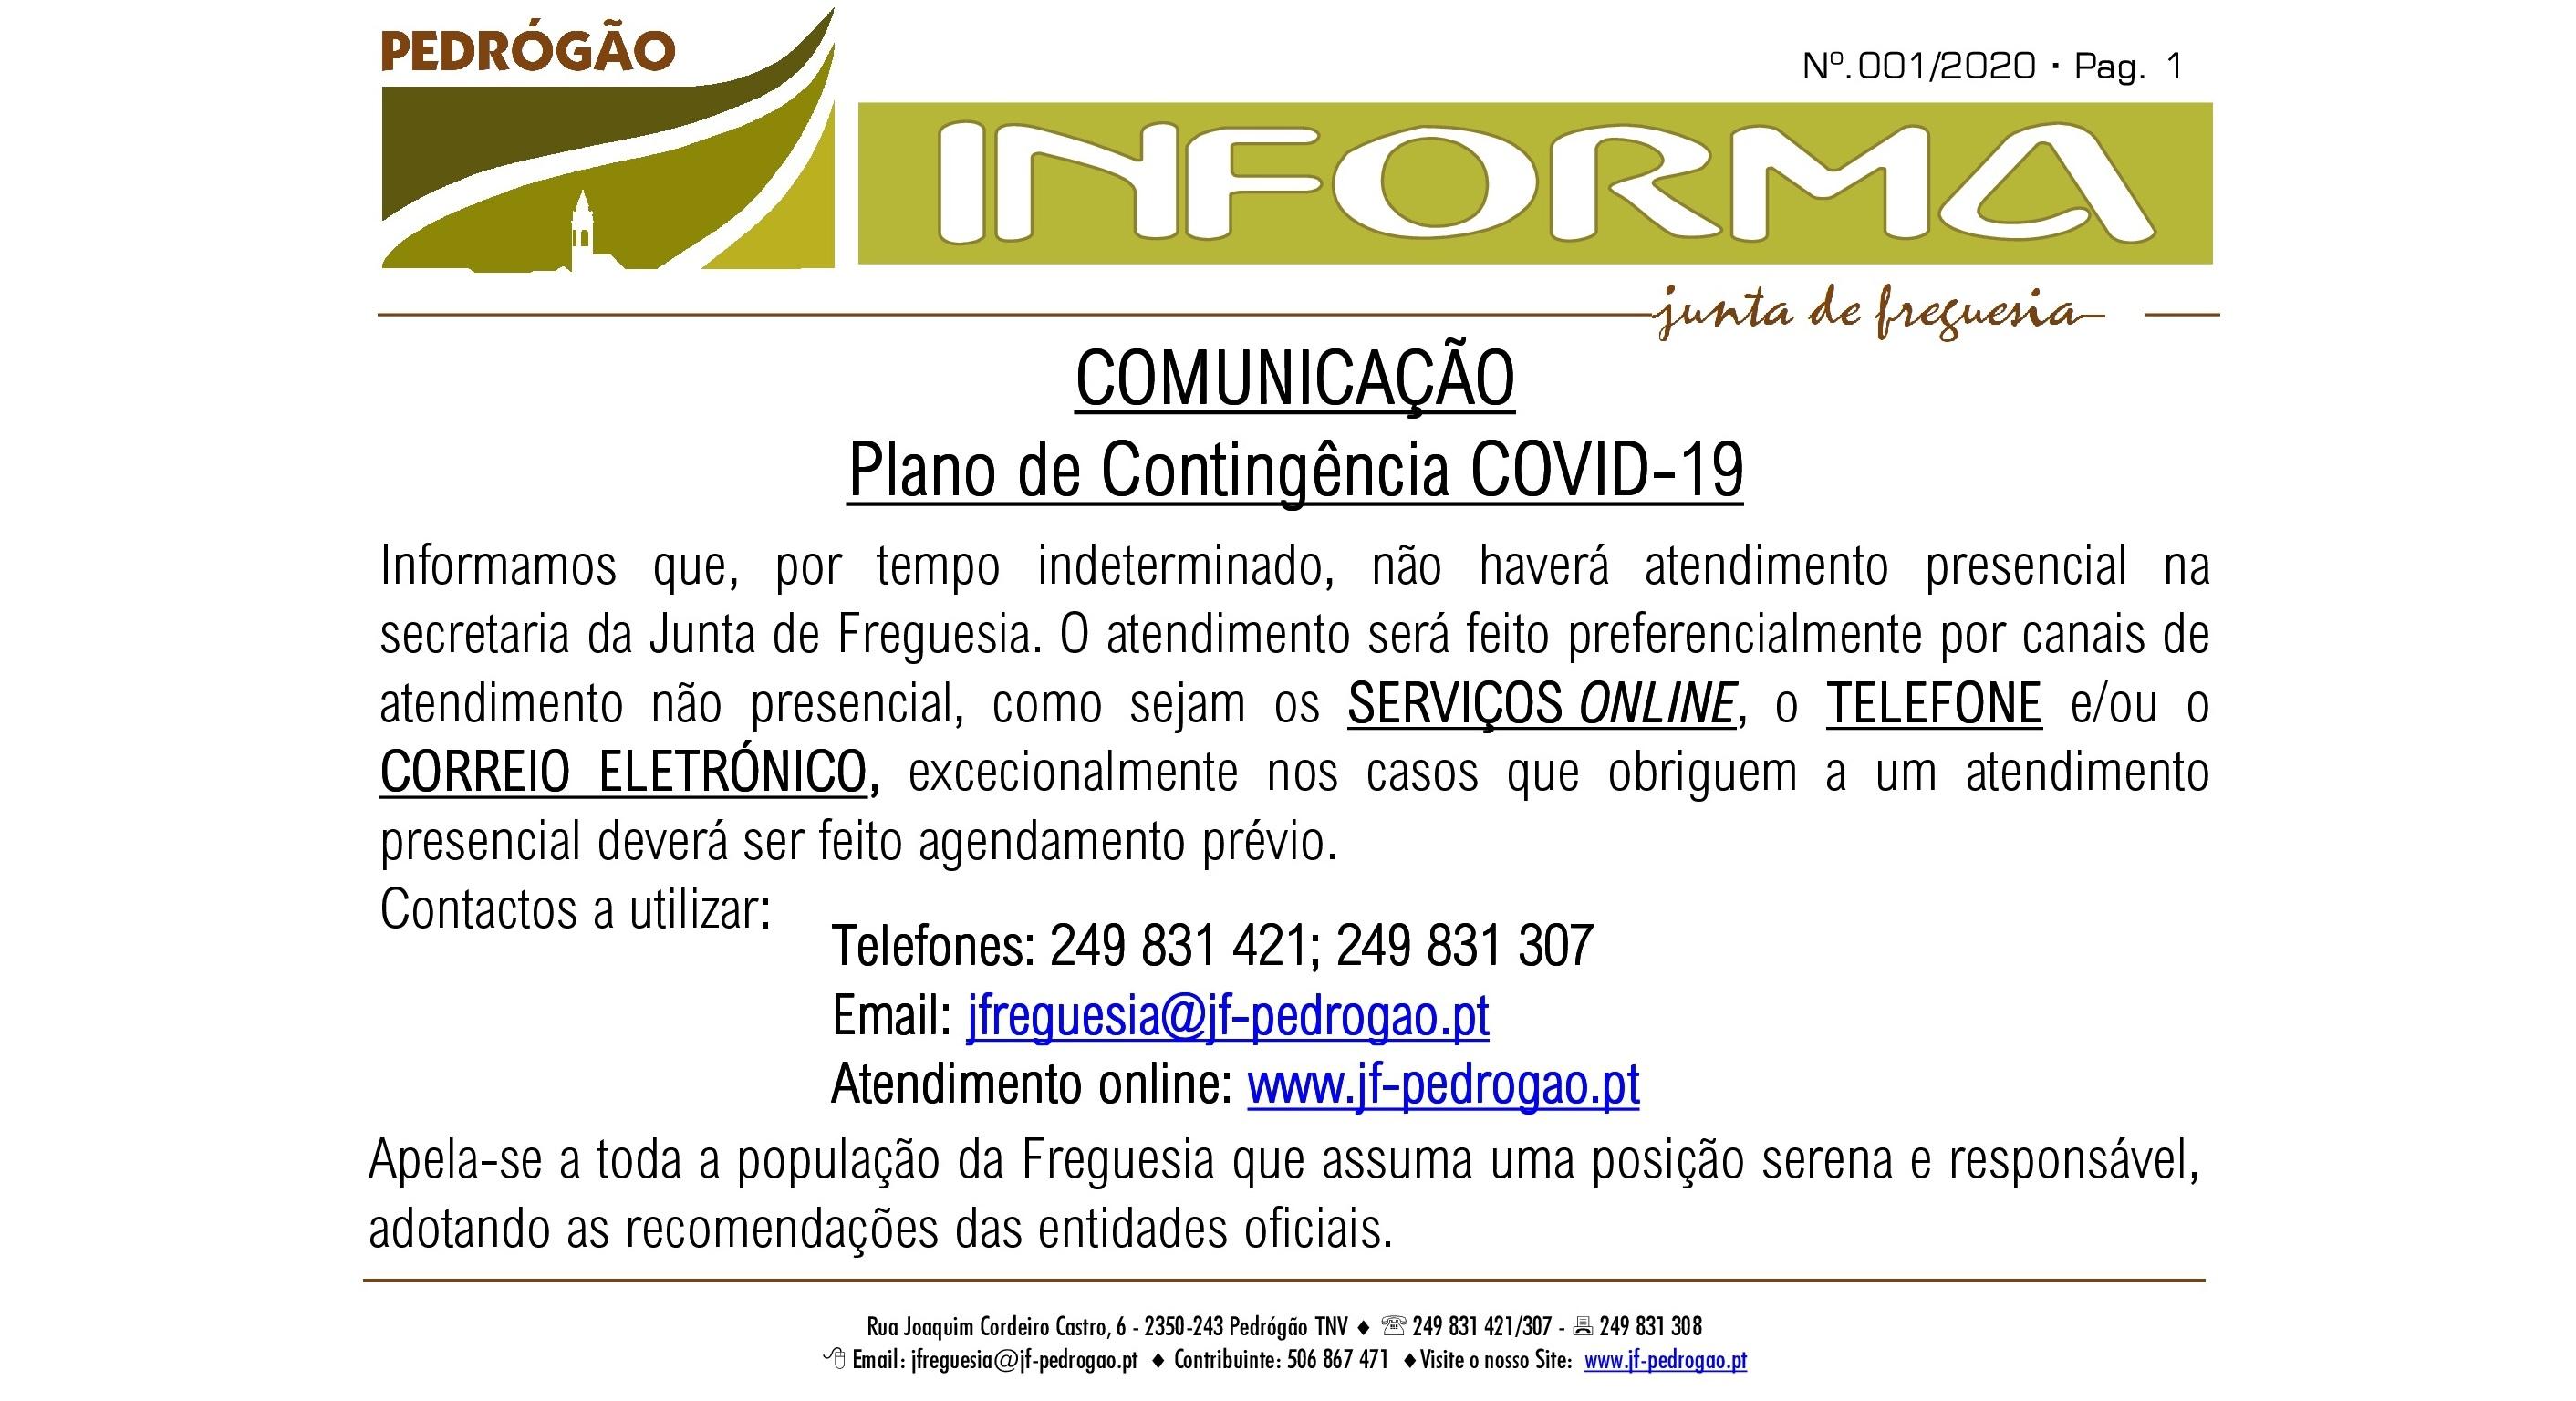 INFORMA_001.16.03